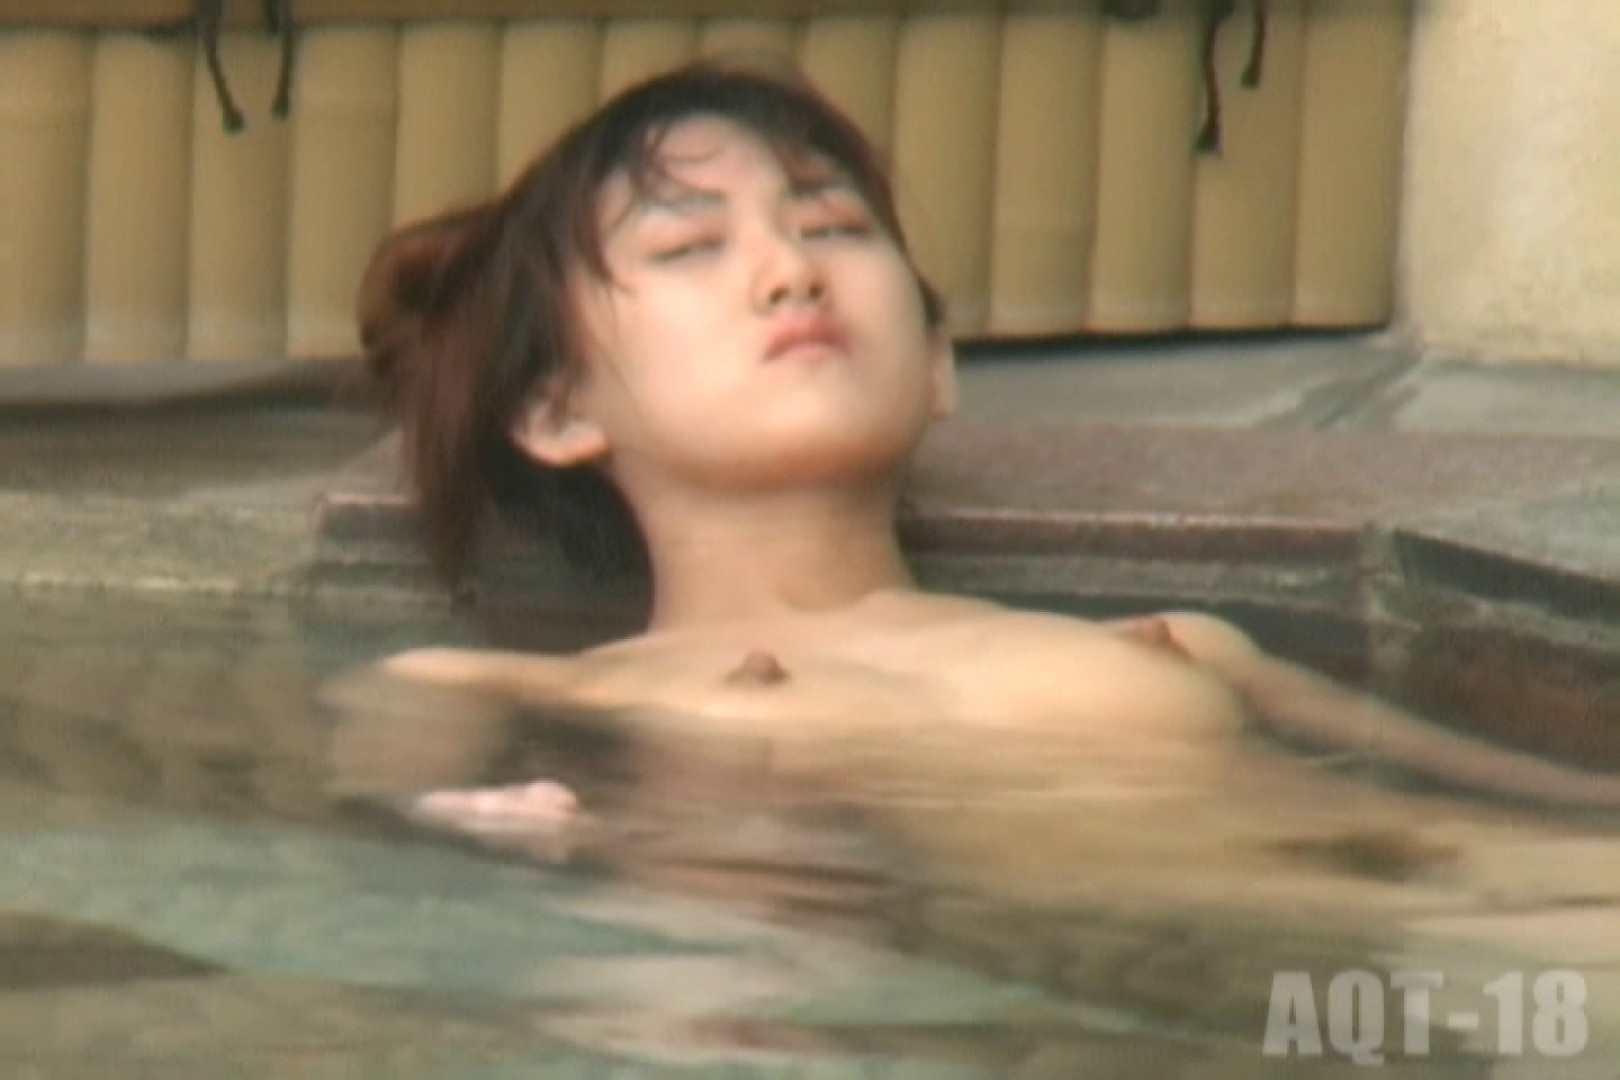 Aquaな露天風呂Vol.862 盗撮 AV無料動画キャプチャ 92PICs 32